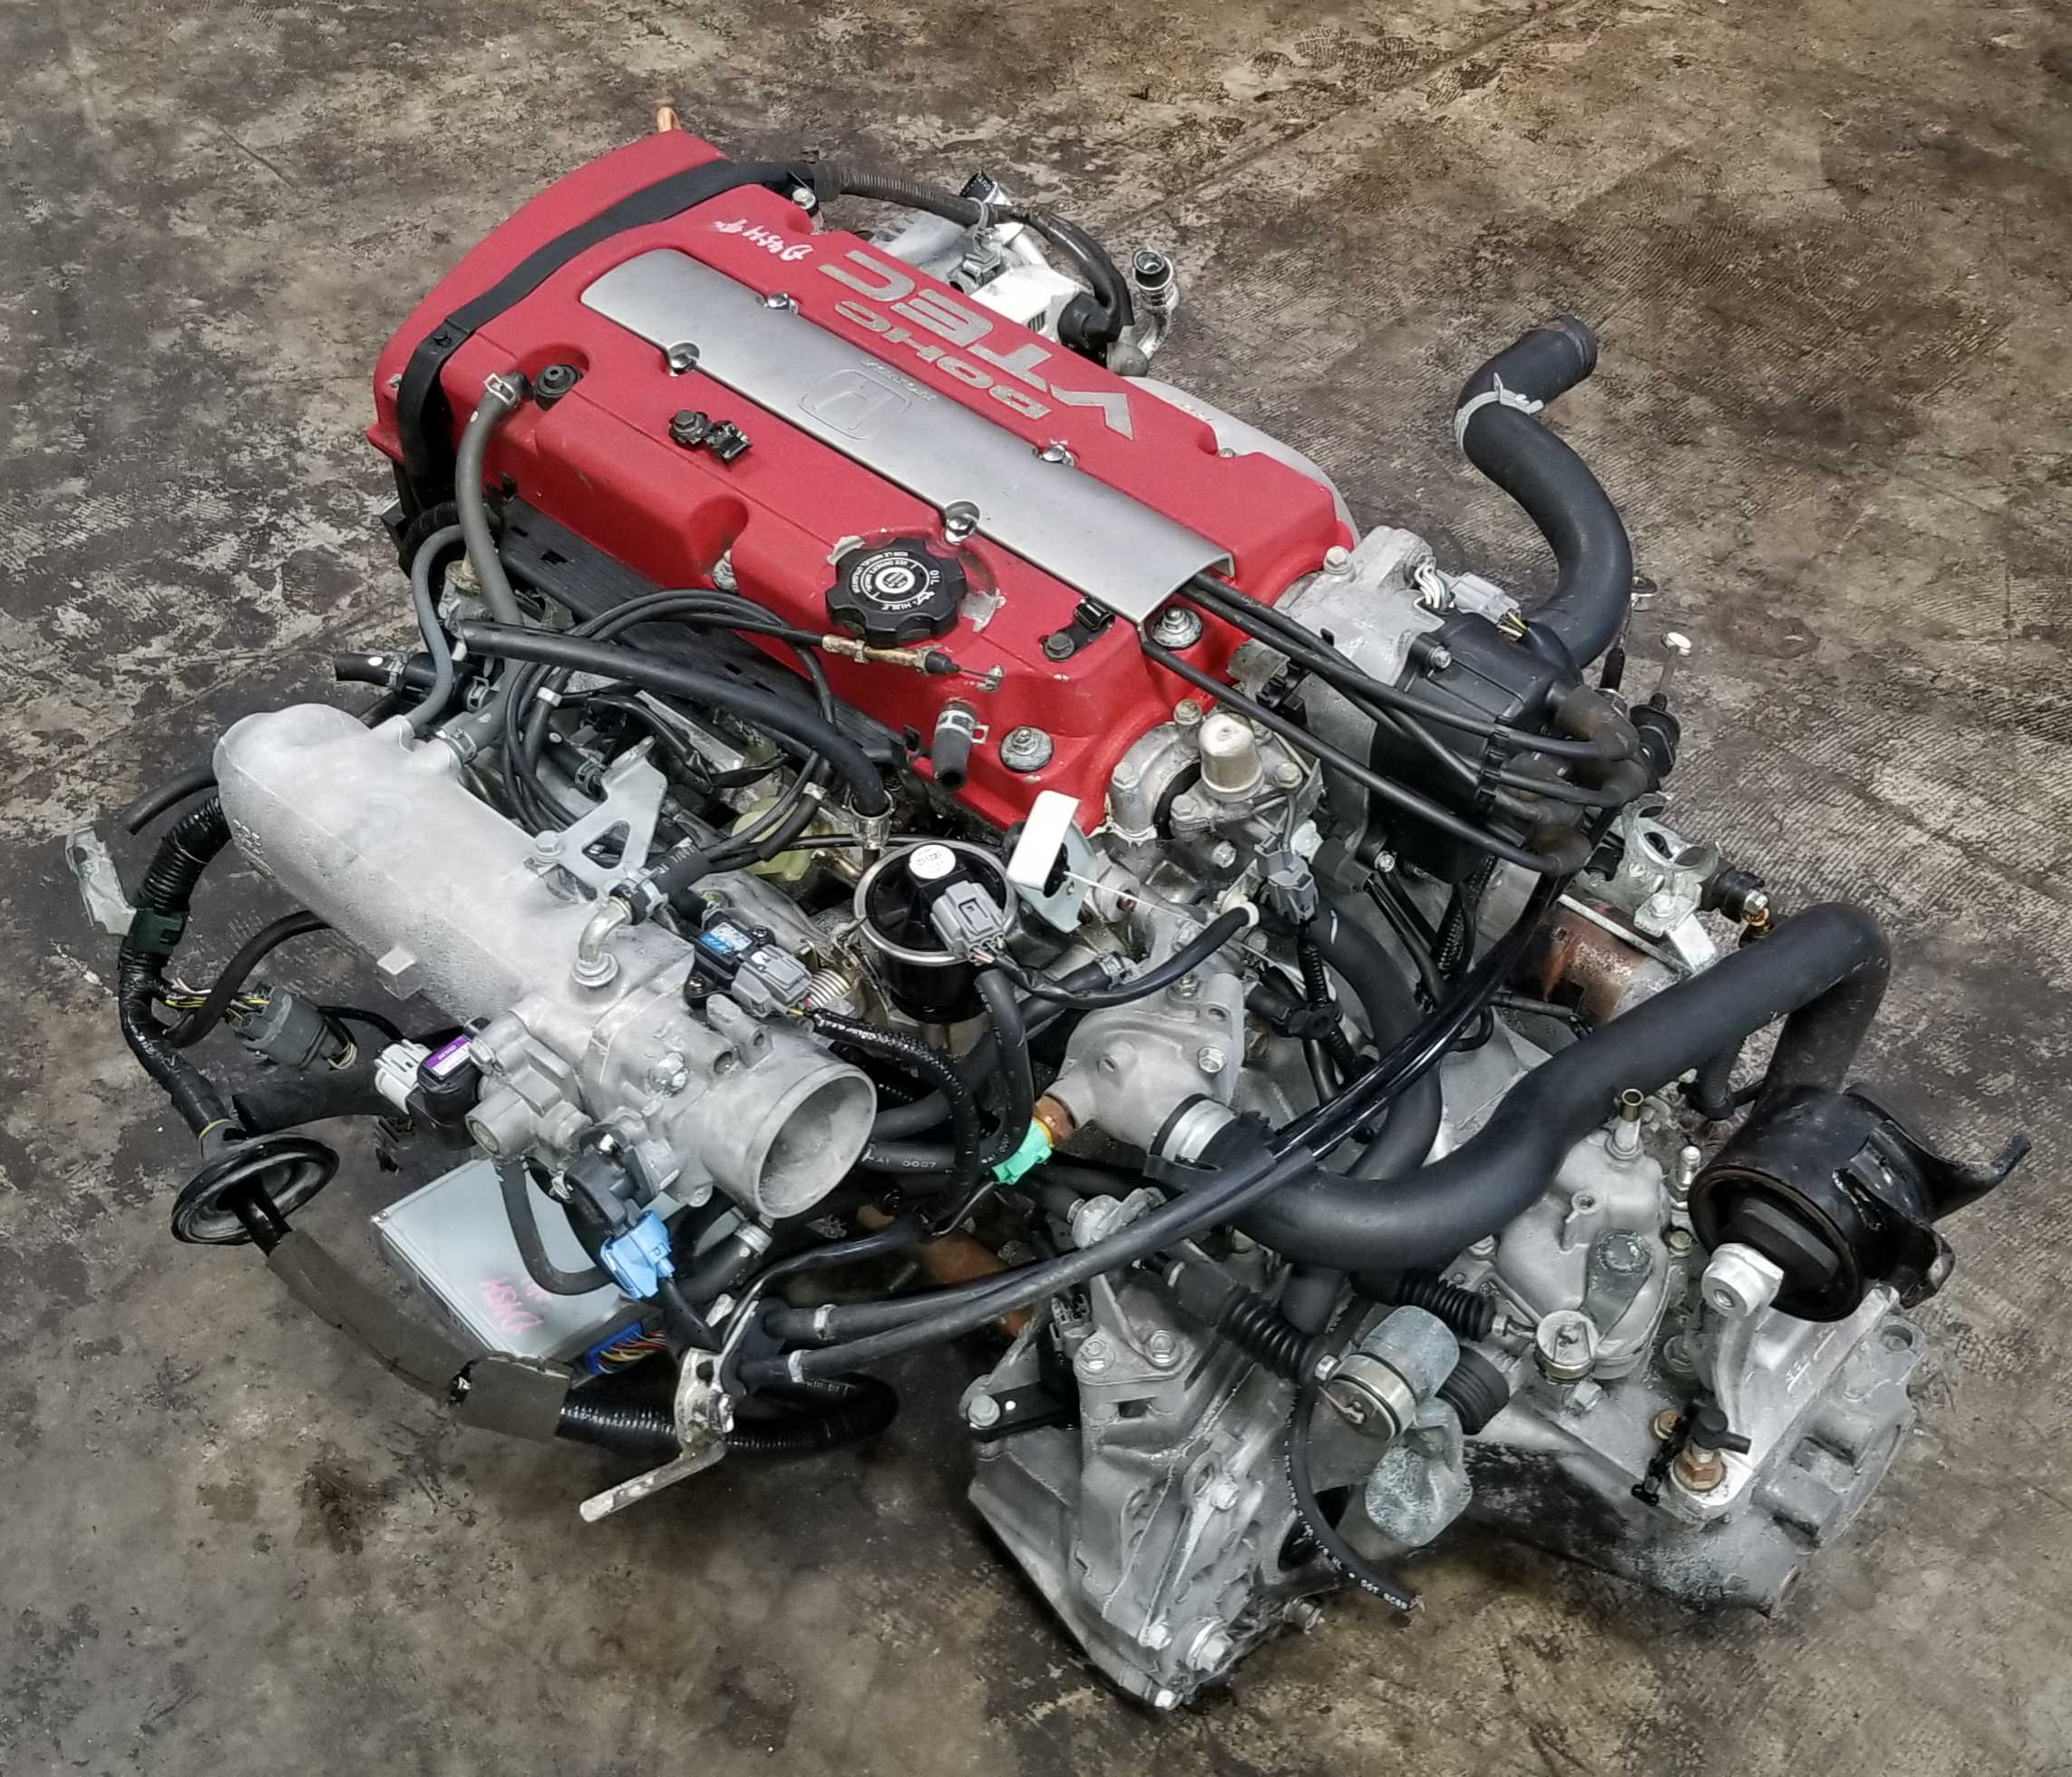 Nissan Chula Vista >> H22A 1997 2001 Honda Accord Prelude 2.2L Euro-R VTEC Engine with T2W4 5speed LSD Manual ...